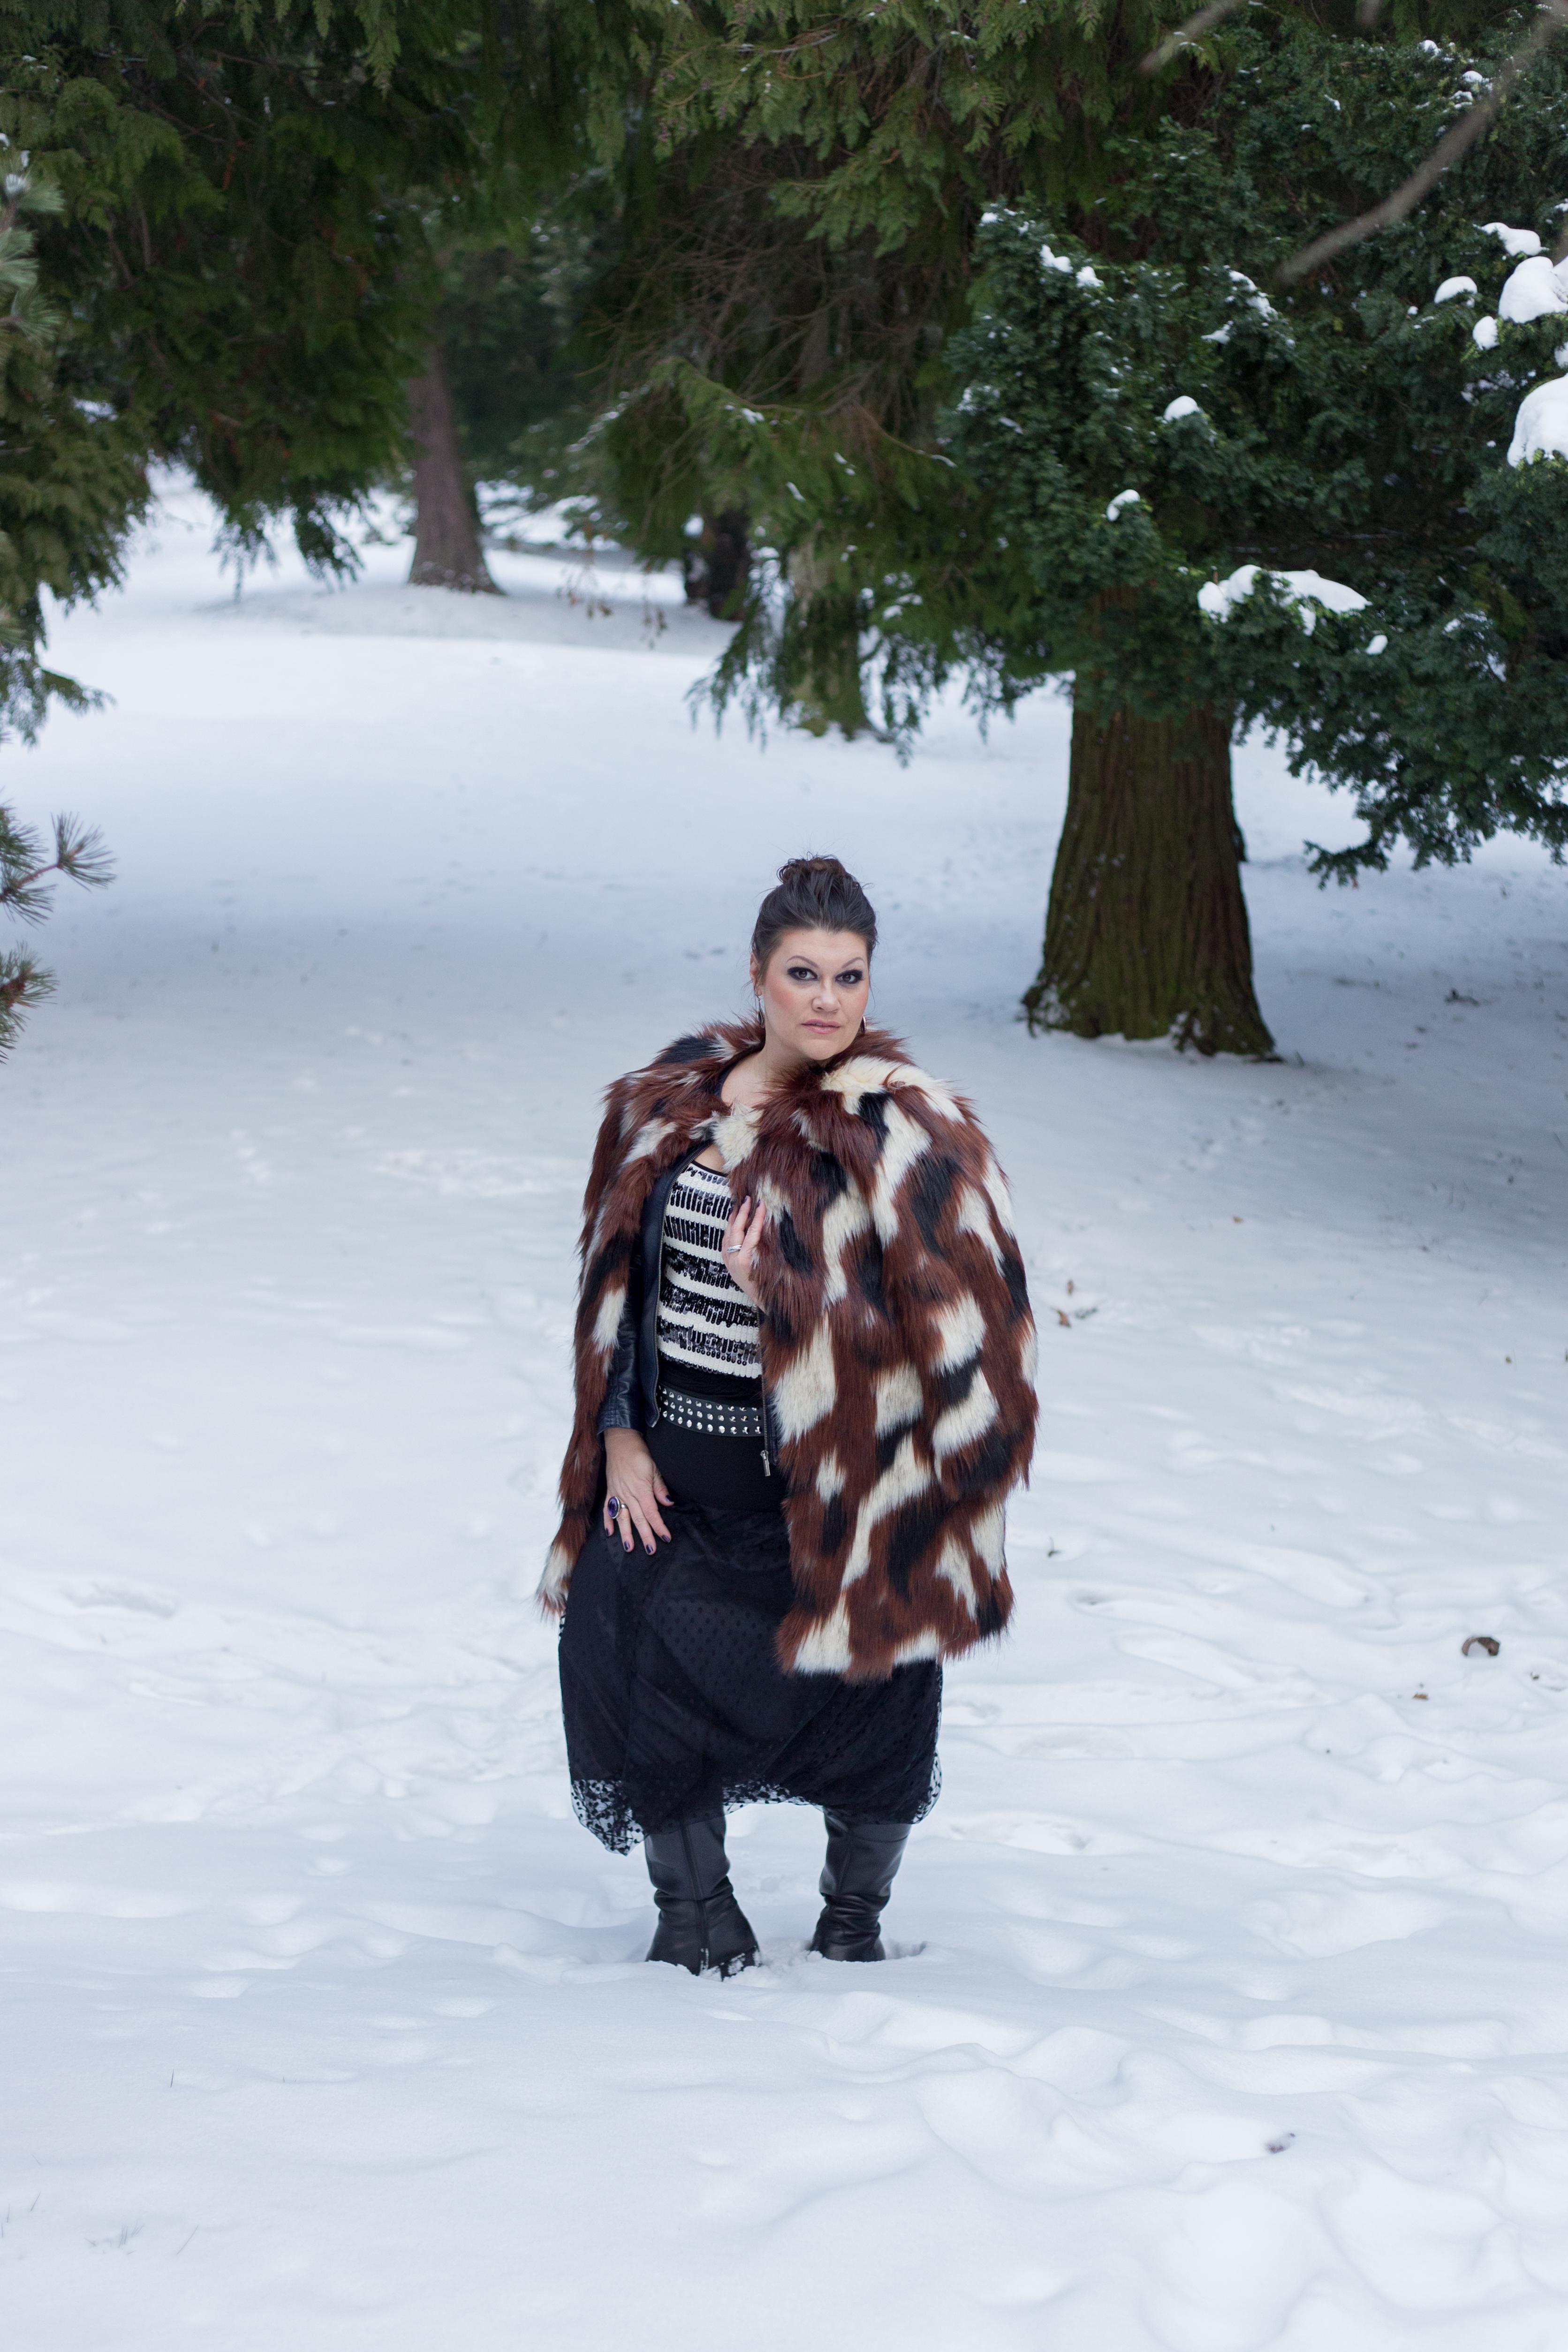 madonna blogger award navabi fauxfur plussize fashion devil queen outfit look pelz fakefur snowwhite kardiaserena (5)